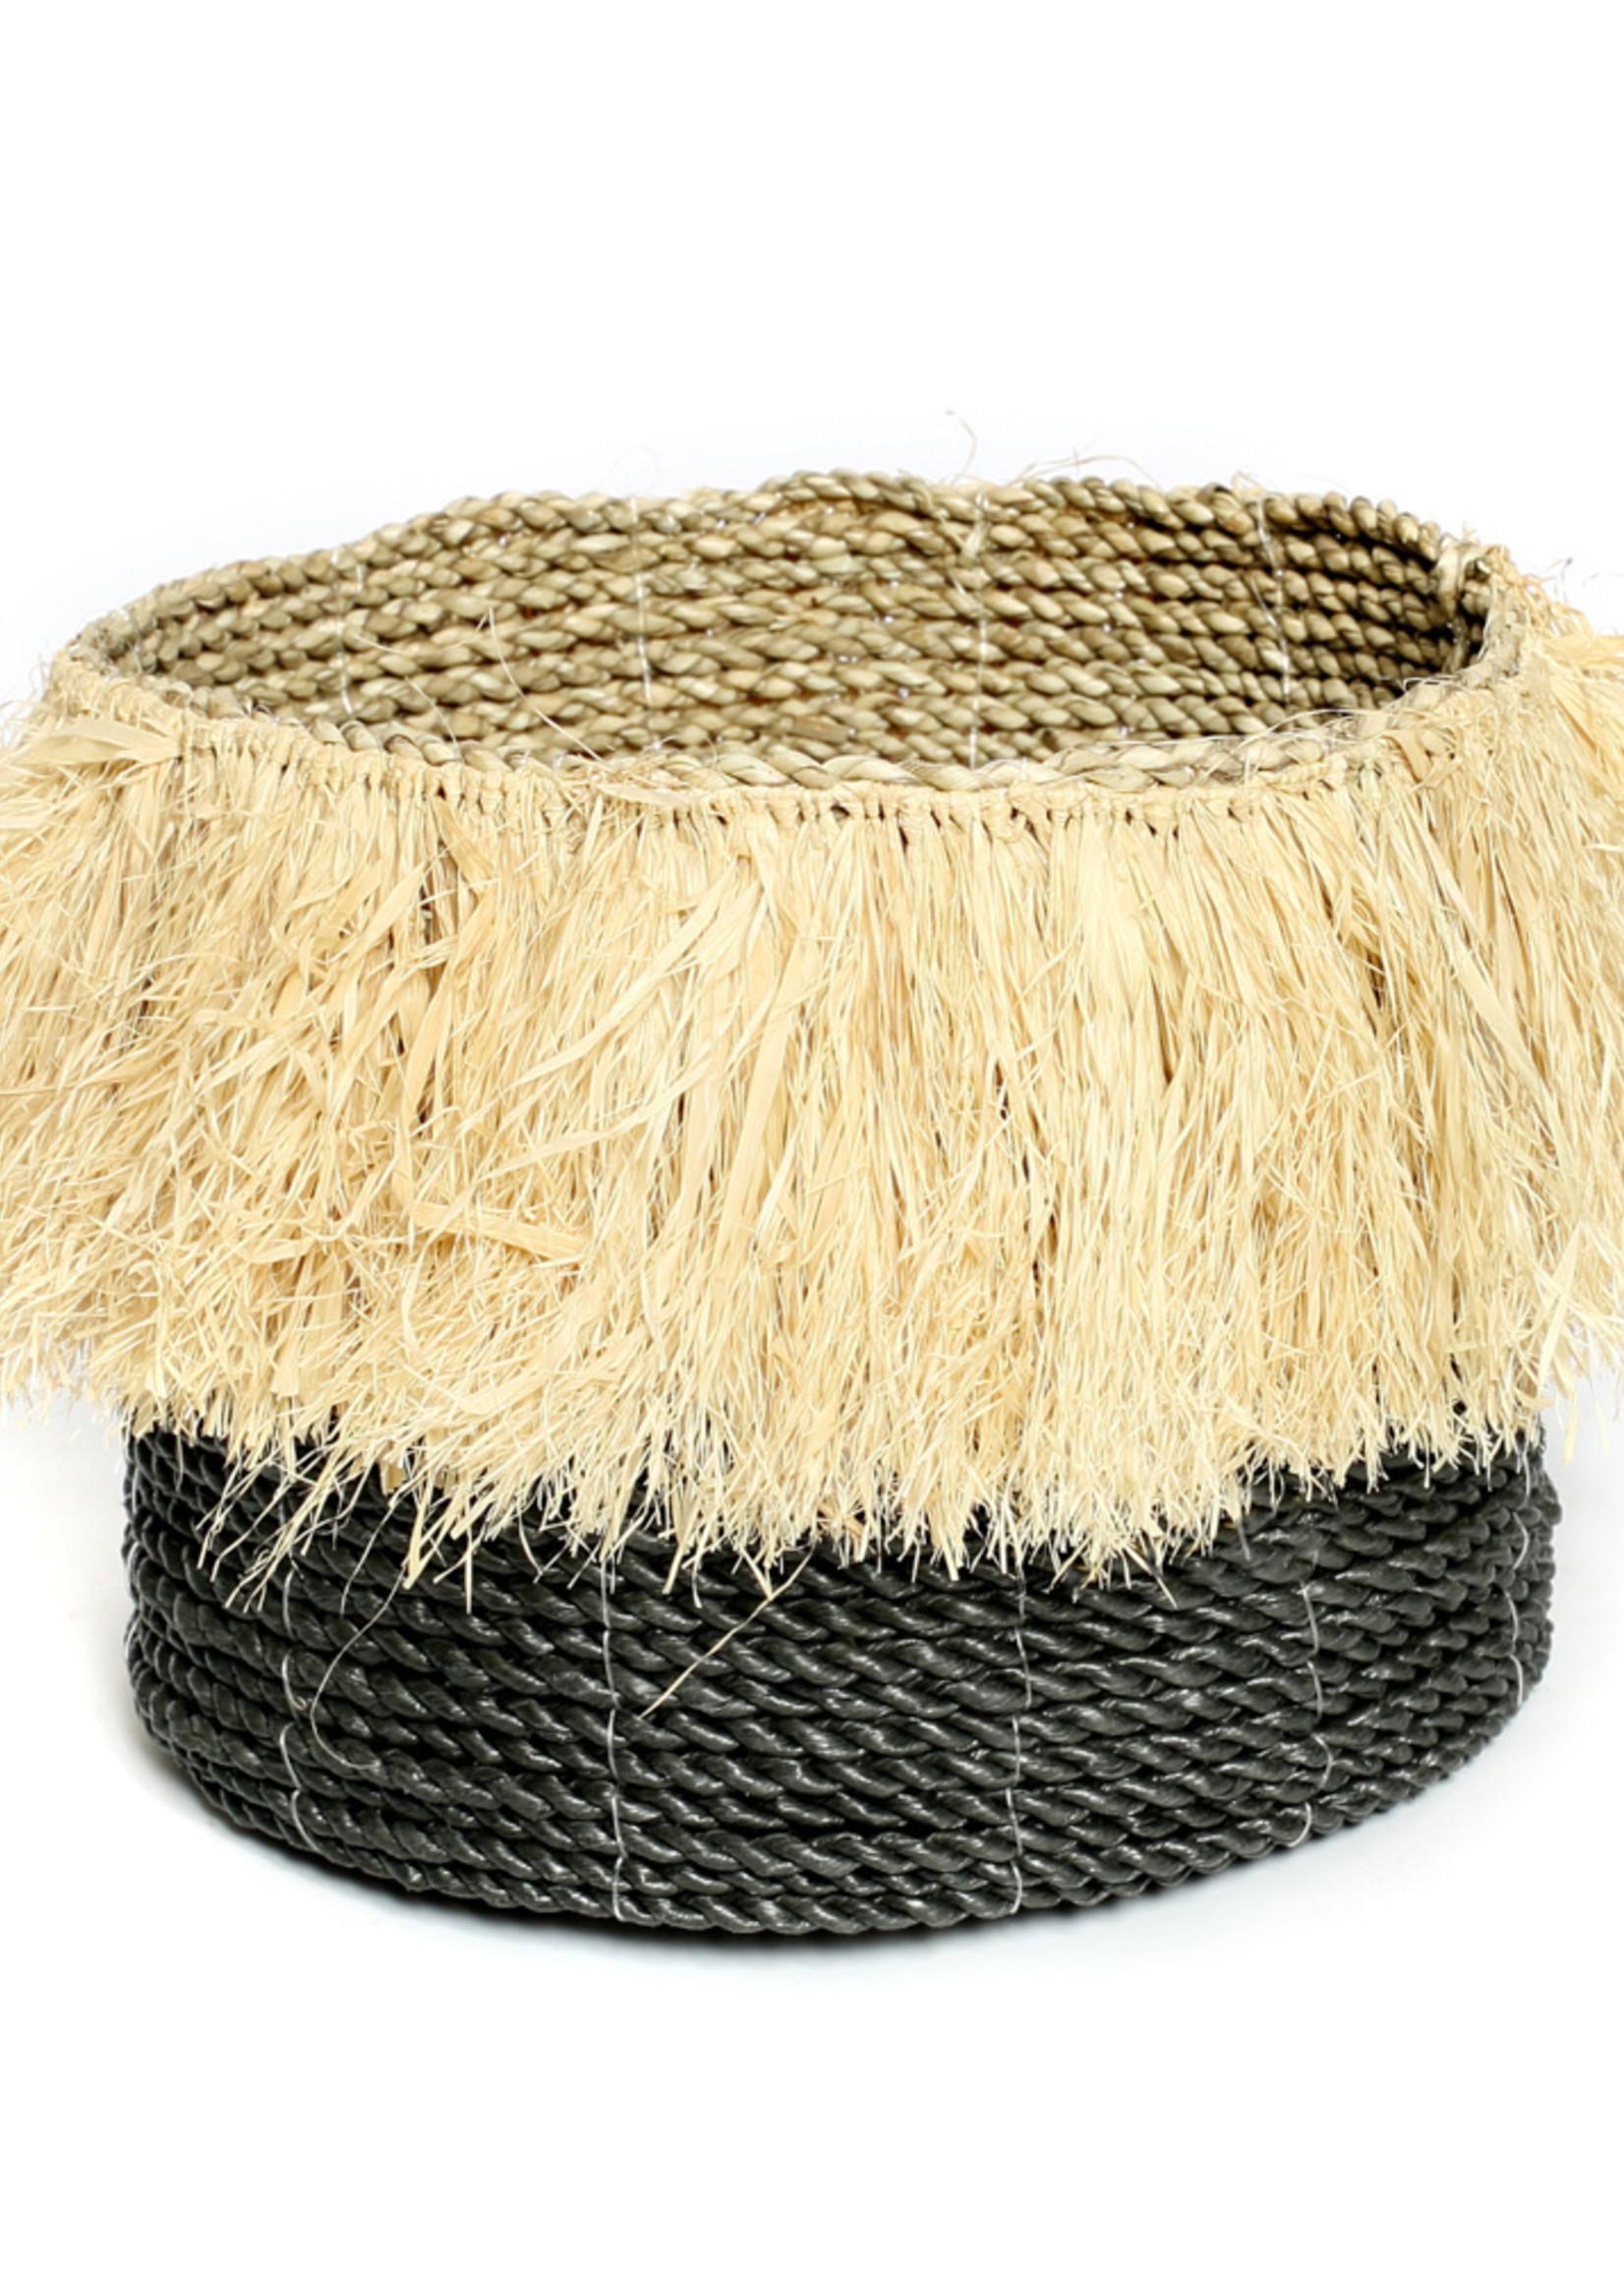 The Aloha Baskets - Black Natural - L